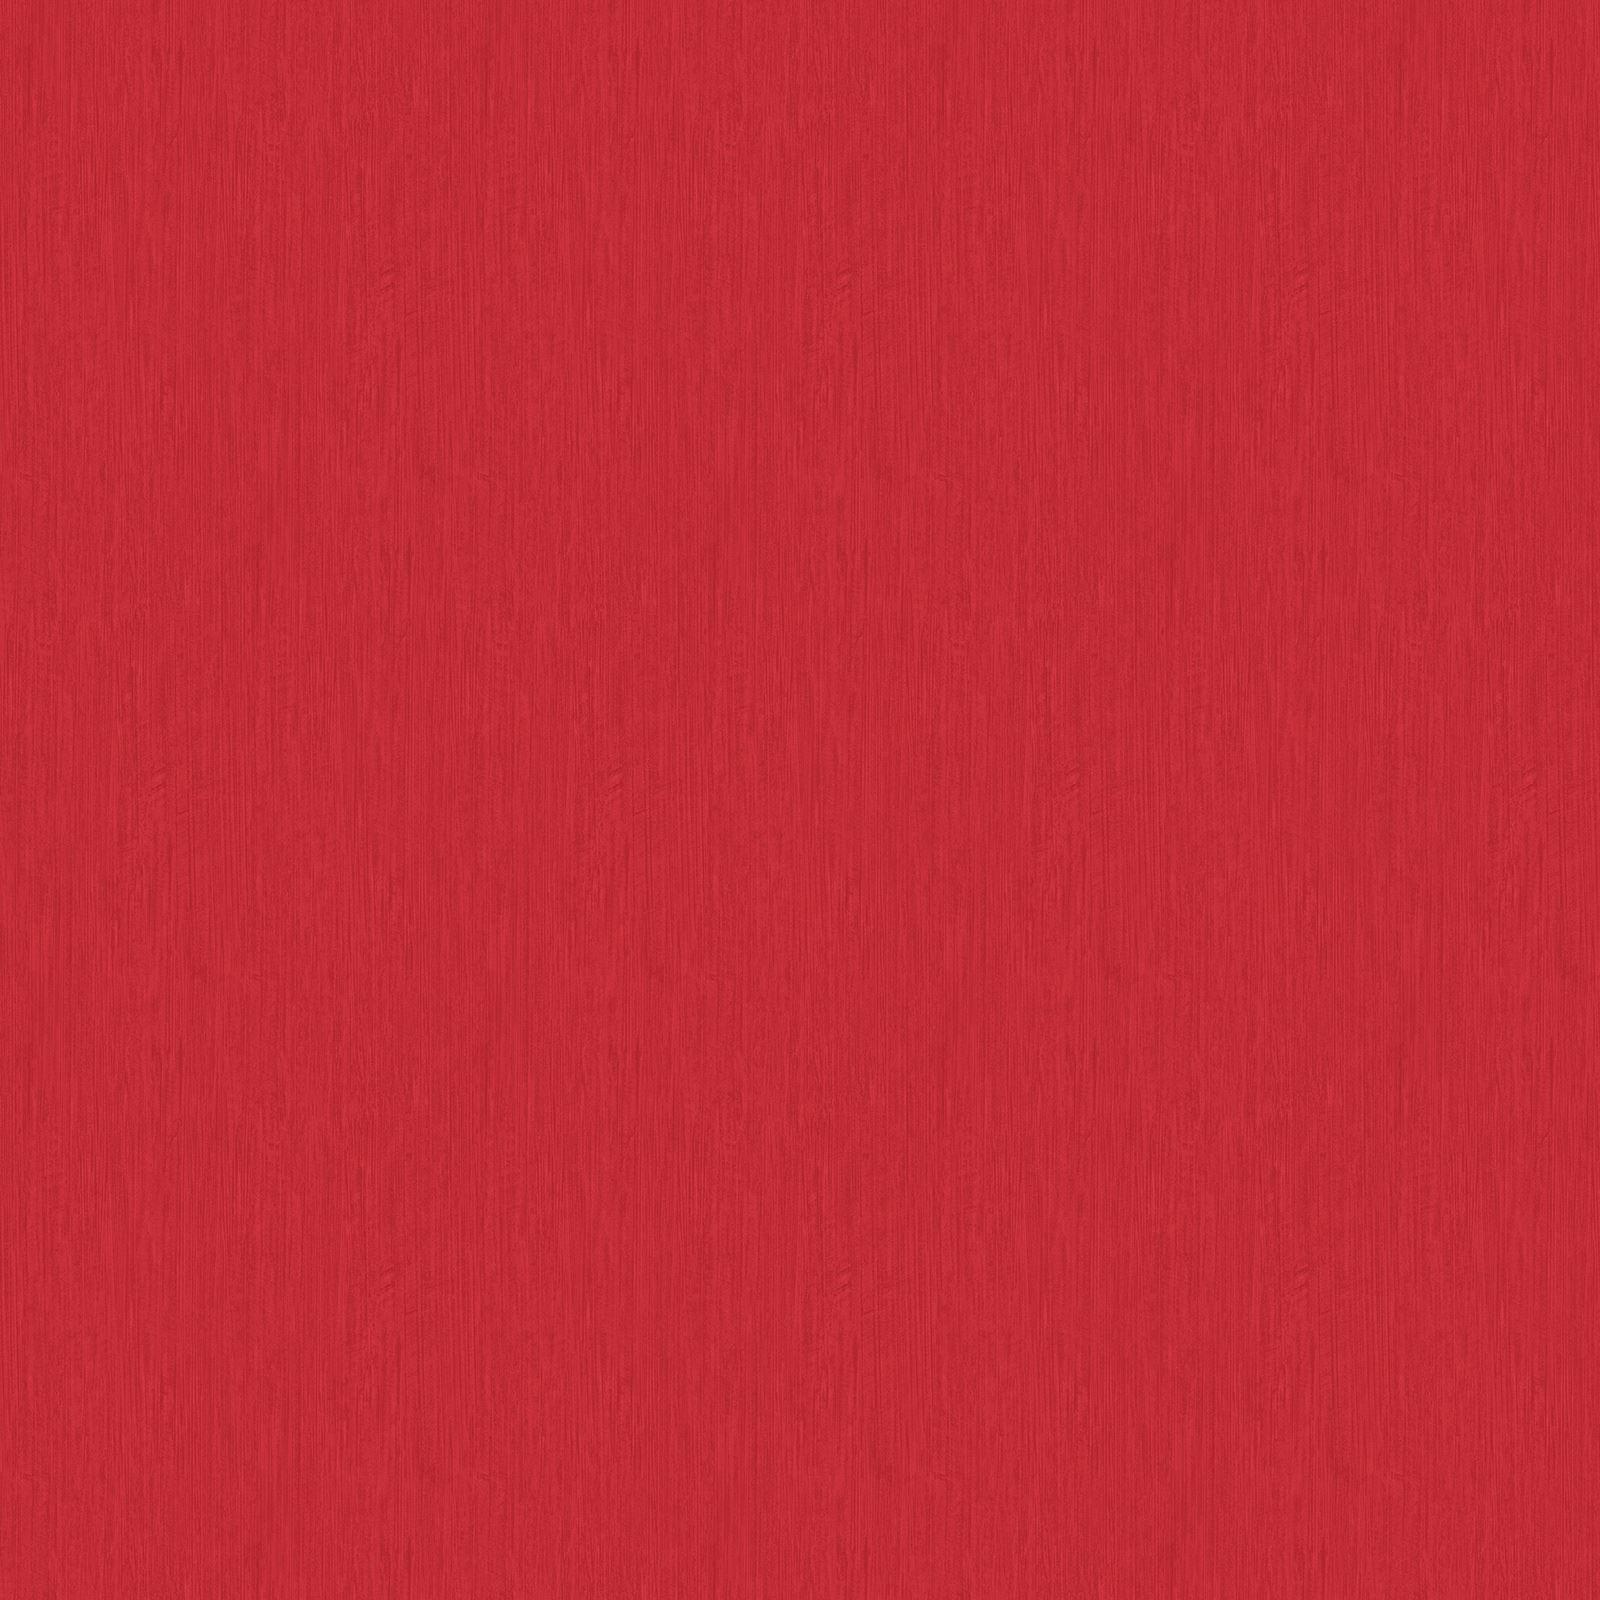 Details About Love Your Walls Shimmer Plain Wallpaper Multi Tonal Stripe Glitter E95110 Red